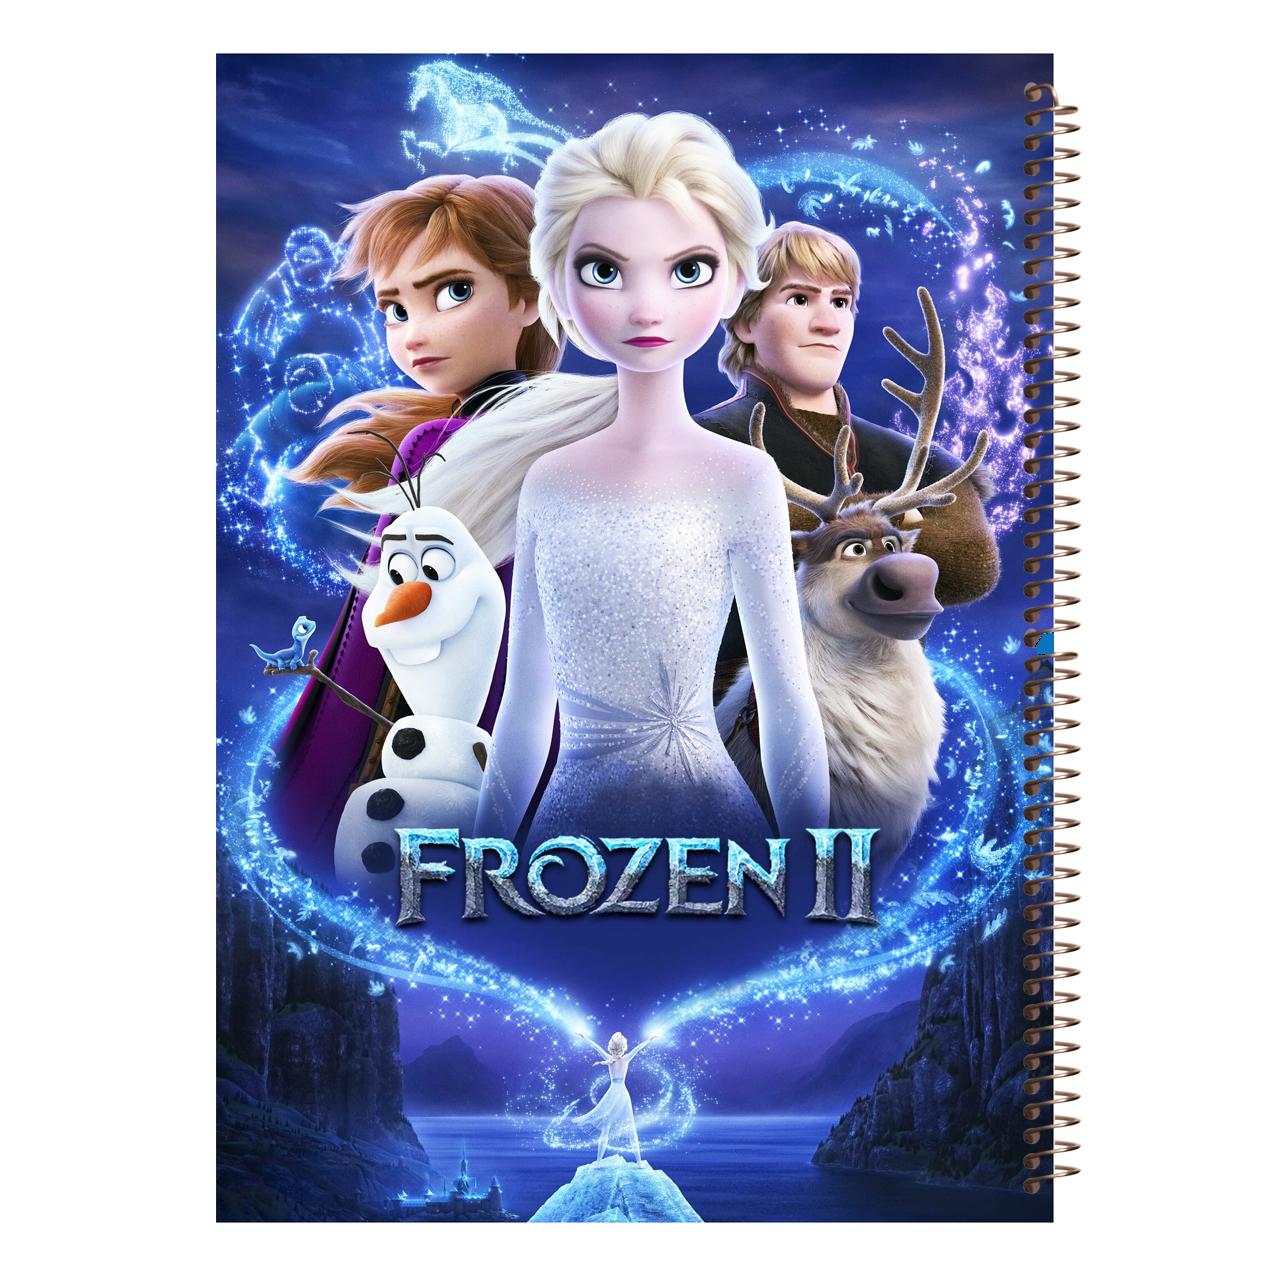 دفتر نقاشی مجنتا طرح Frozen کد 83